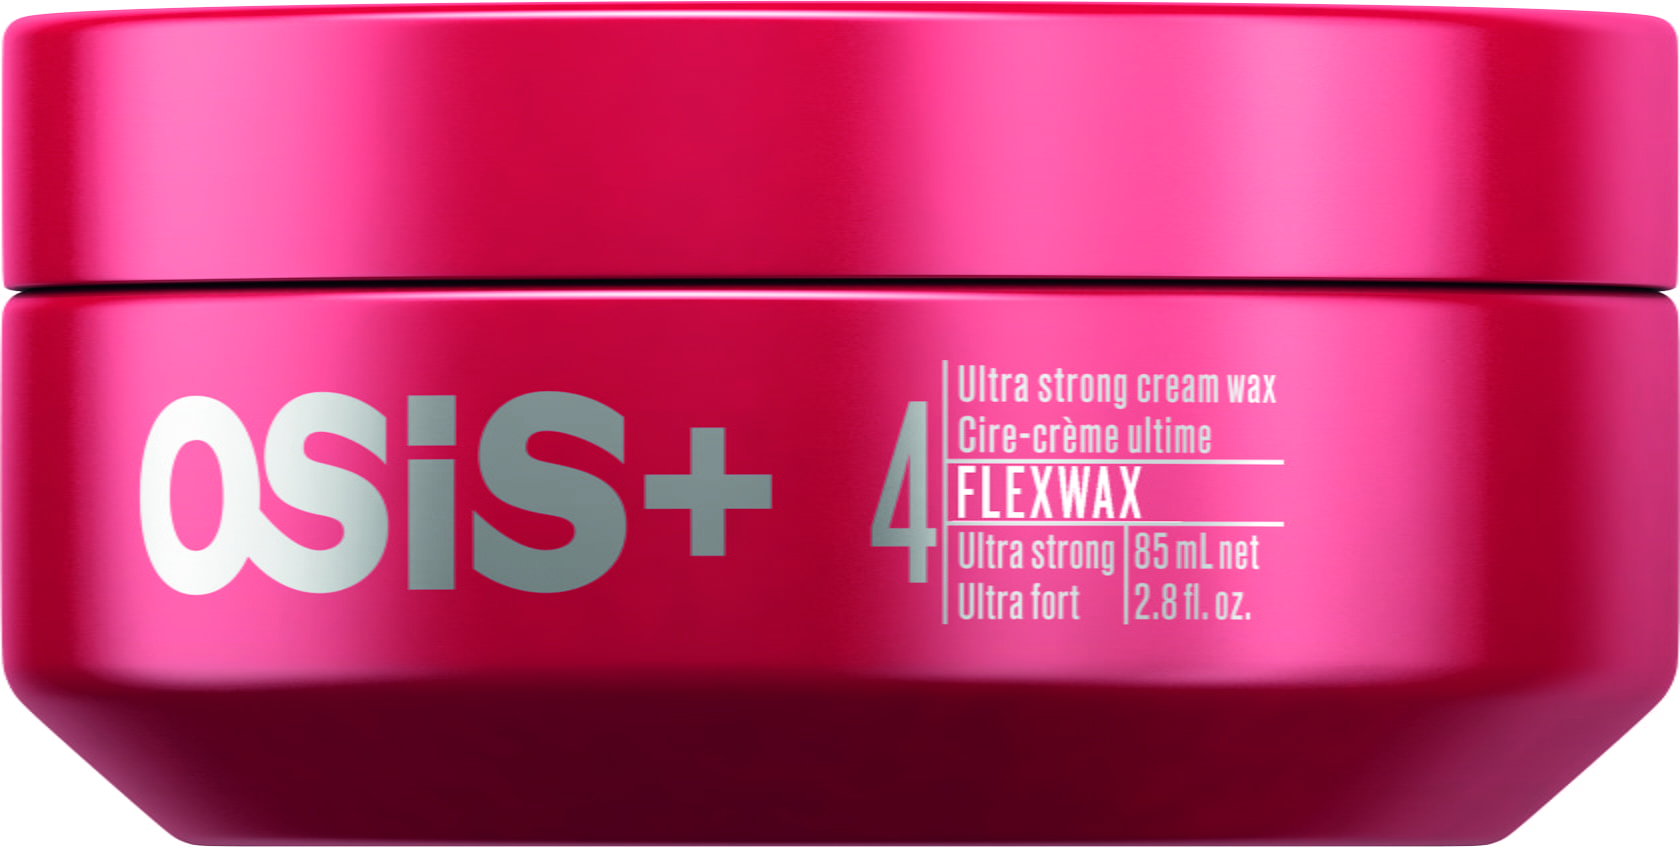 Cera Flexwax | Osis+